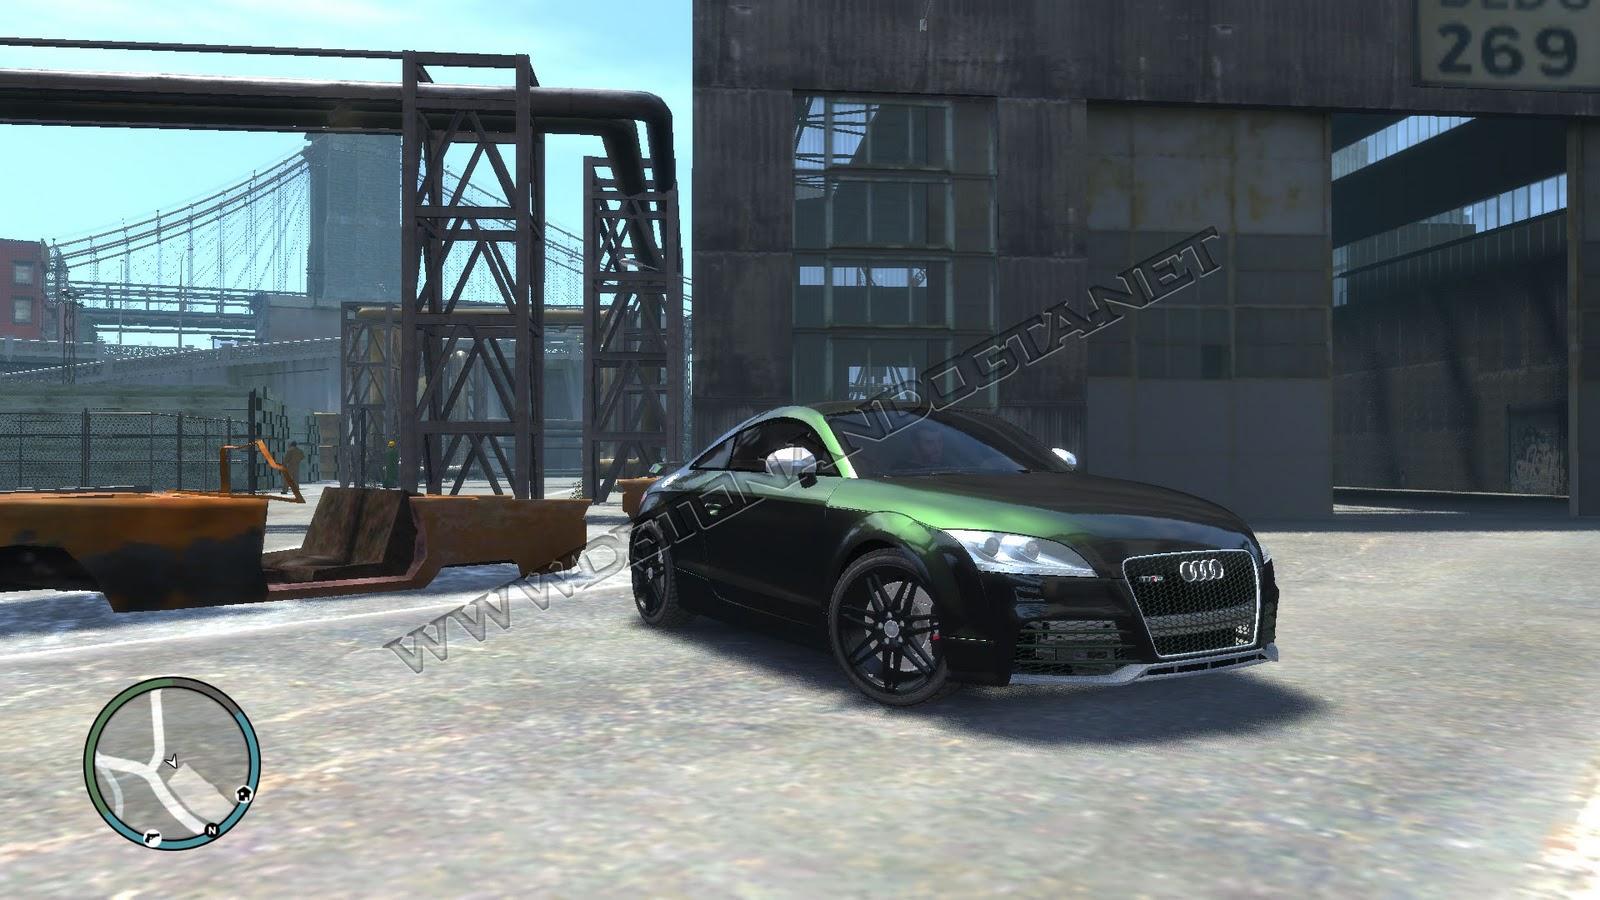 DG  GTA IV   Audi TT Euro Tuning HD Wallpaper